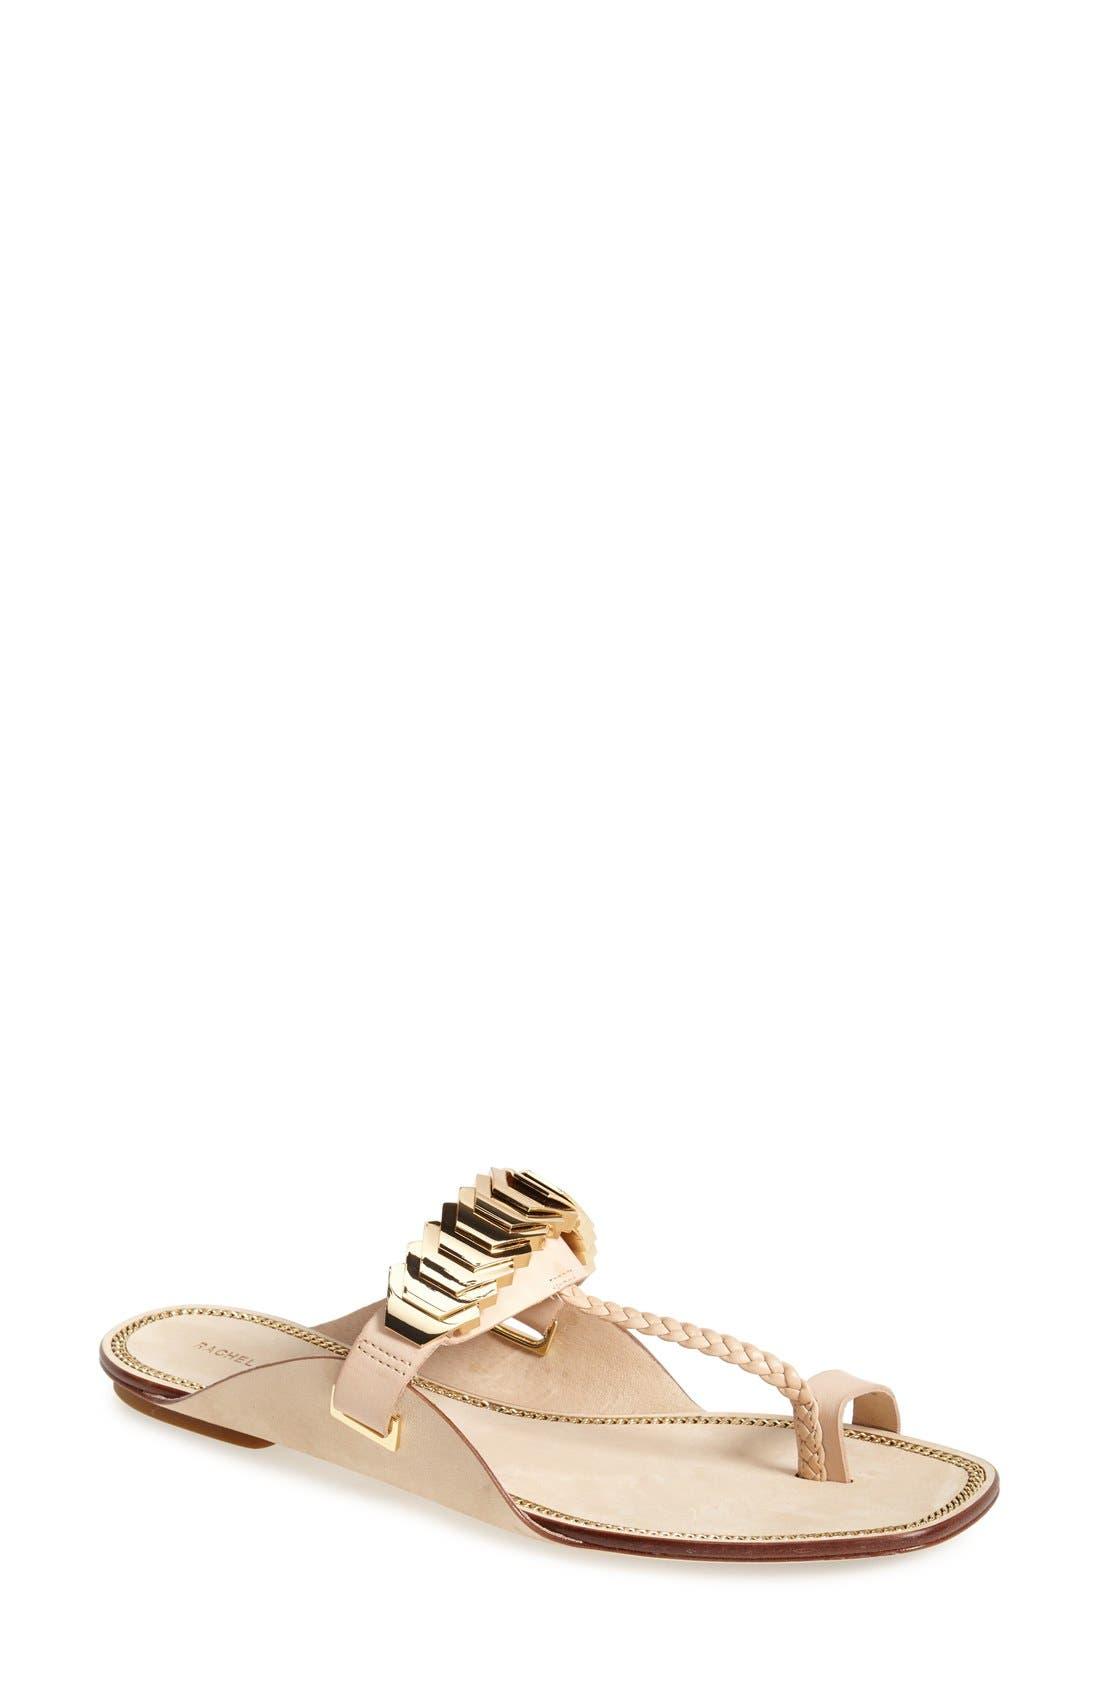 Alternate Image 1 Selected - Rachel Zoe 'Ida' Leather Toe Loop Sandal (Women)